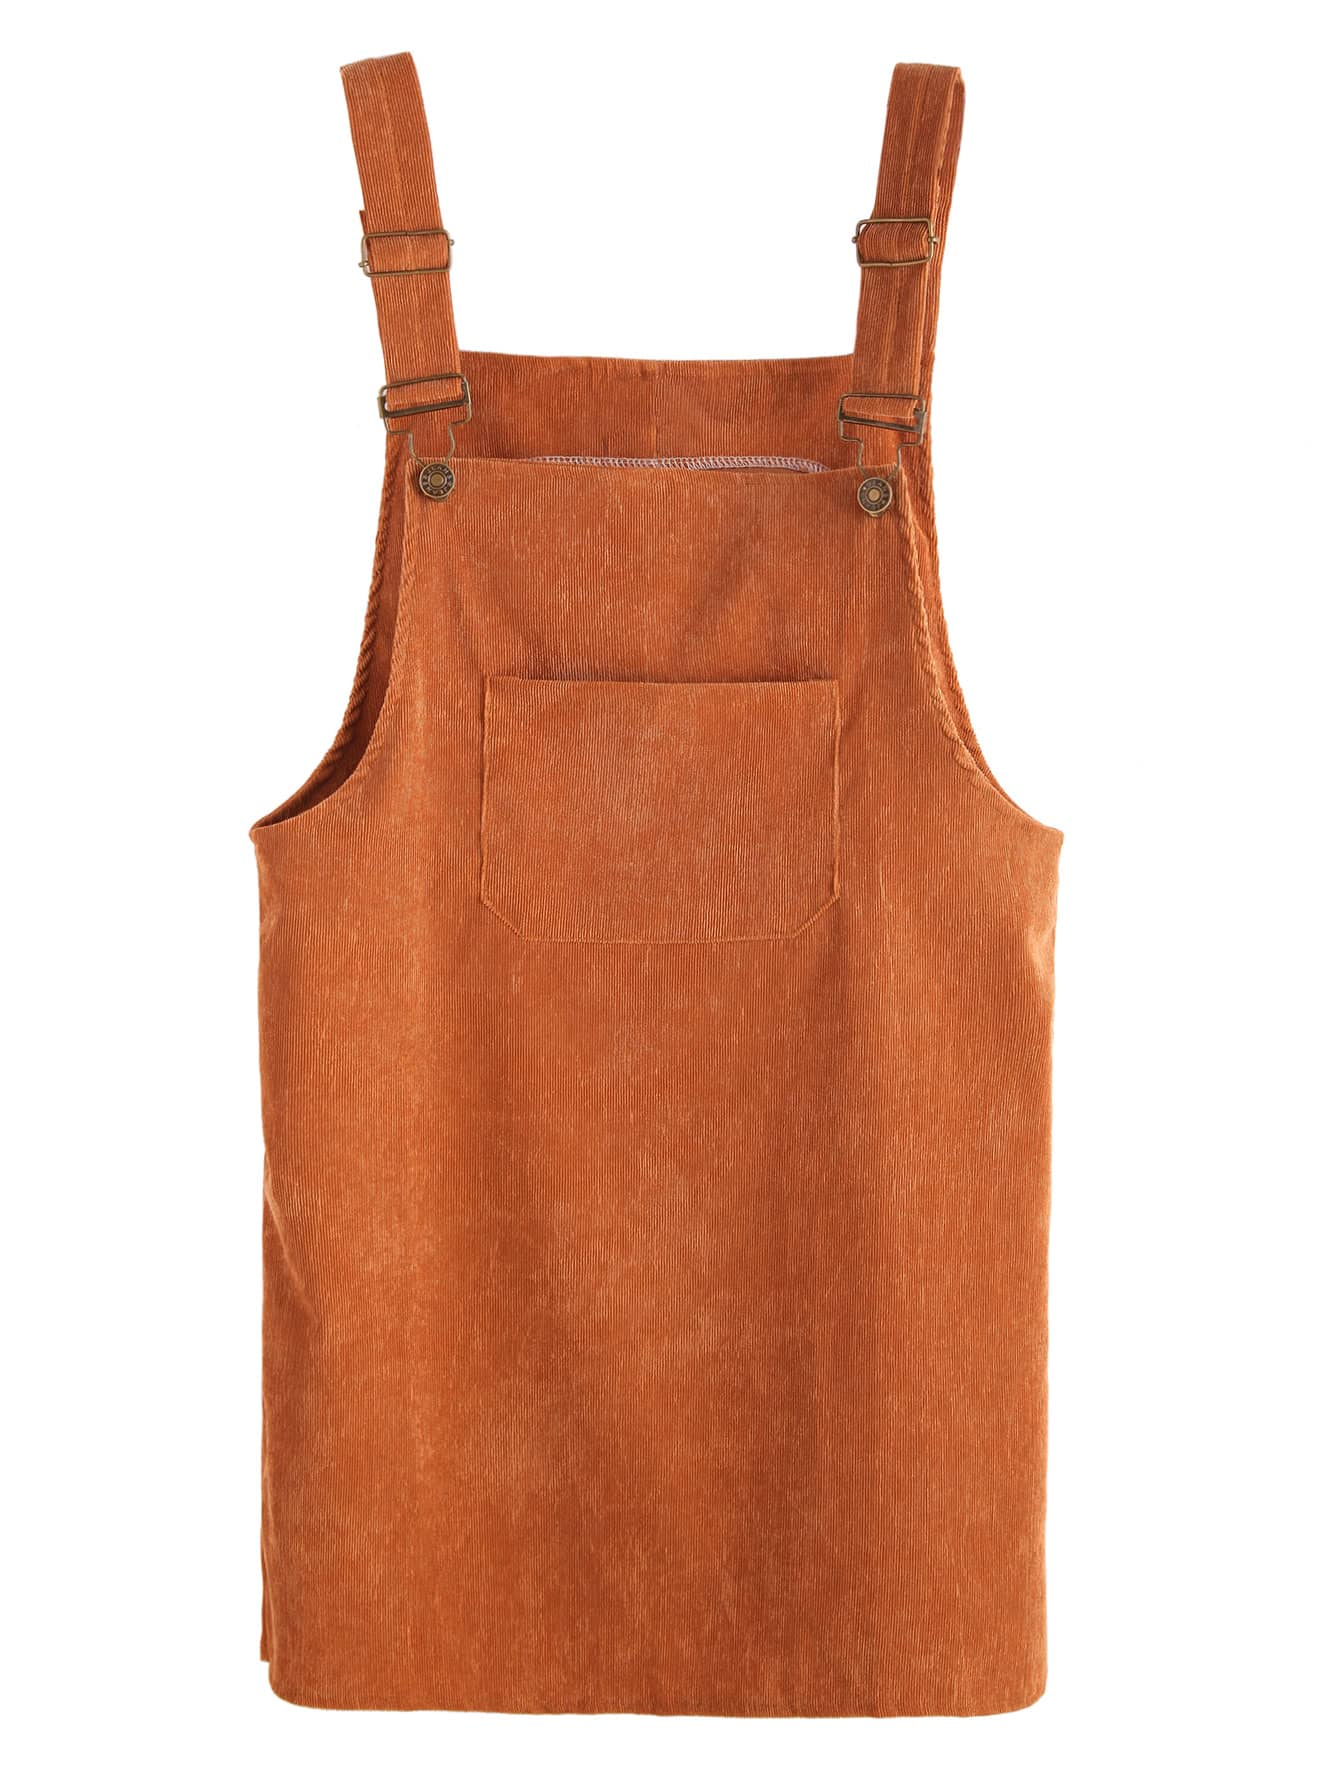 Corduroy Dungaree Dress With Pocket dress160916106